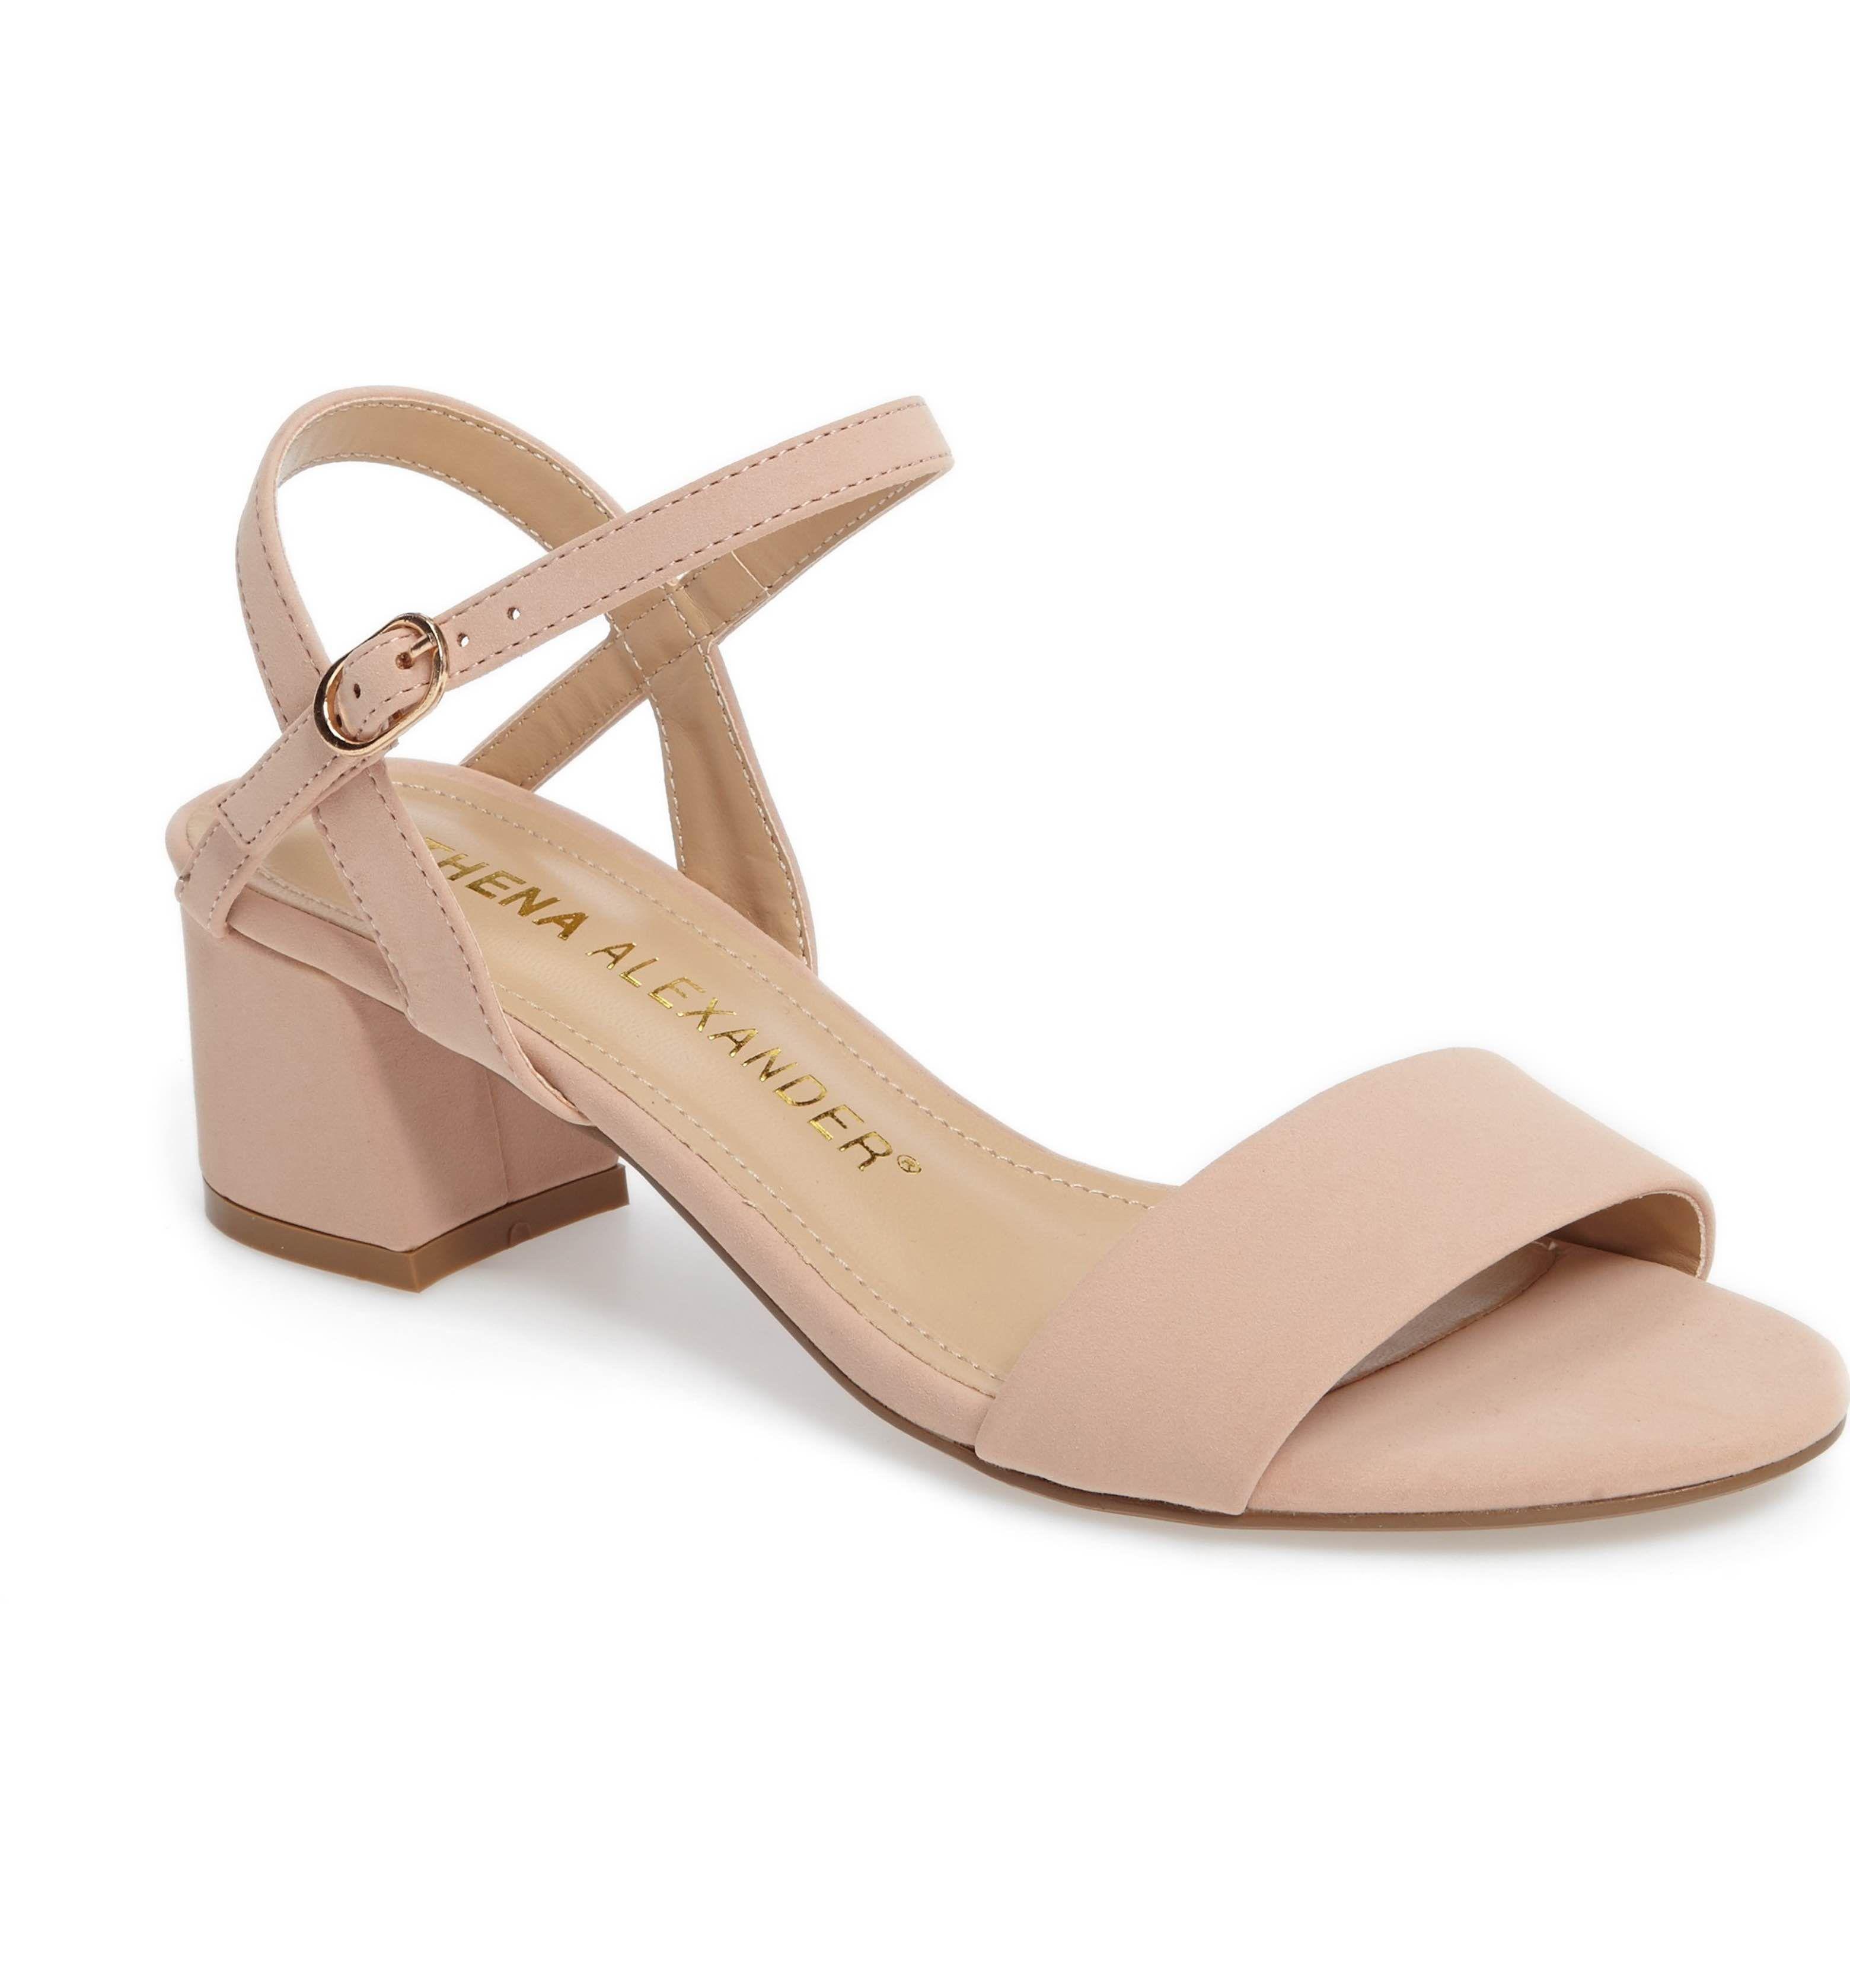 Athena Alexander Jacoba Block Heel Sandal (Women) | Nordstrom